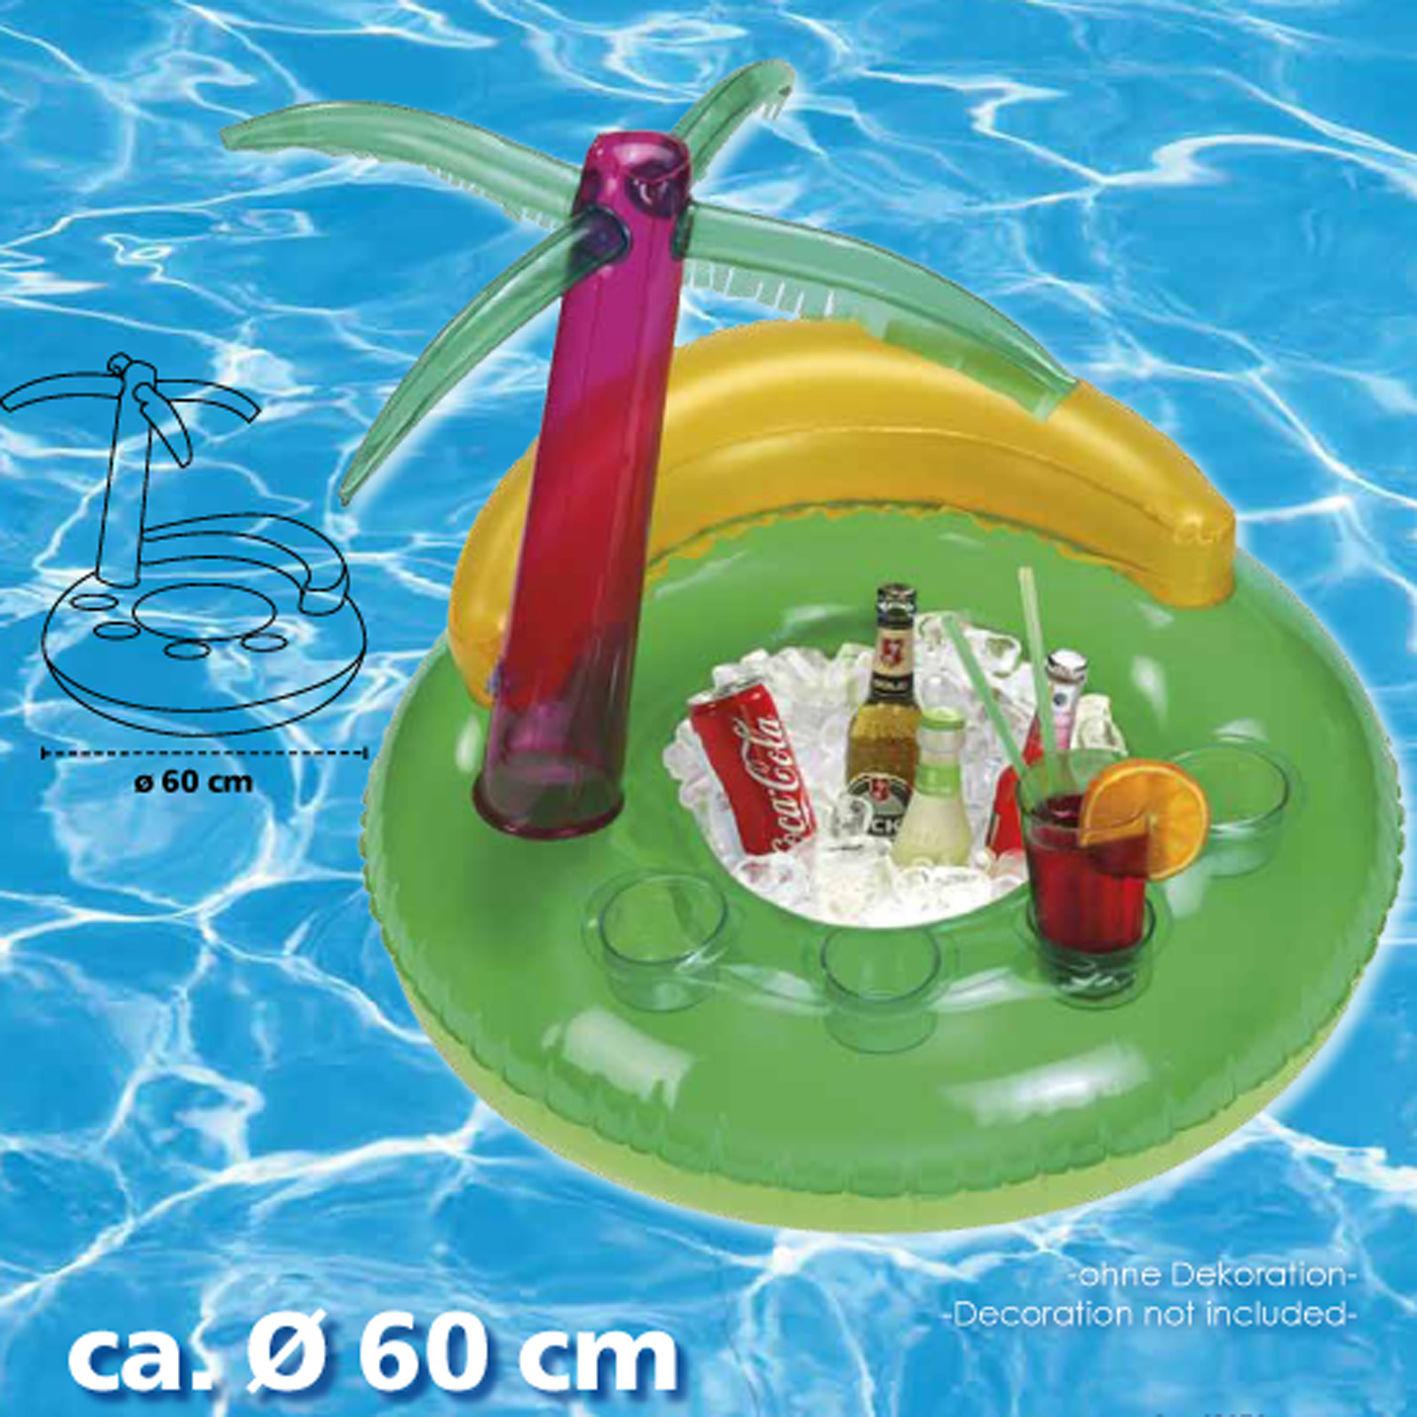 60 cm Badeinsel Pool Bar BANANA /Ø ca